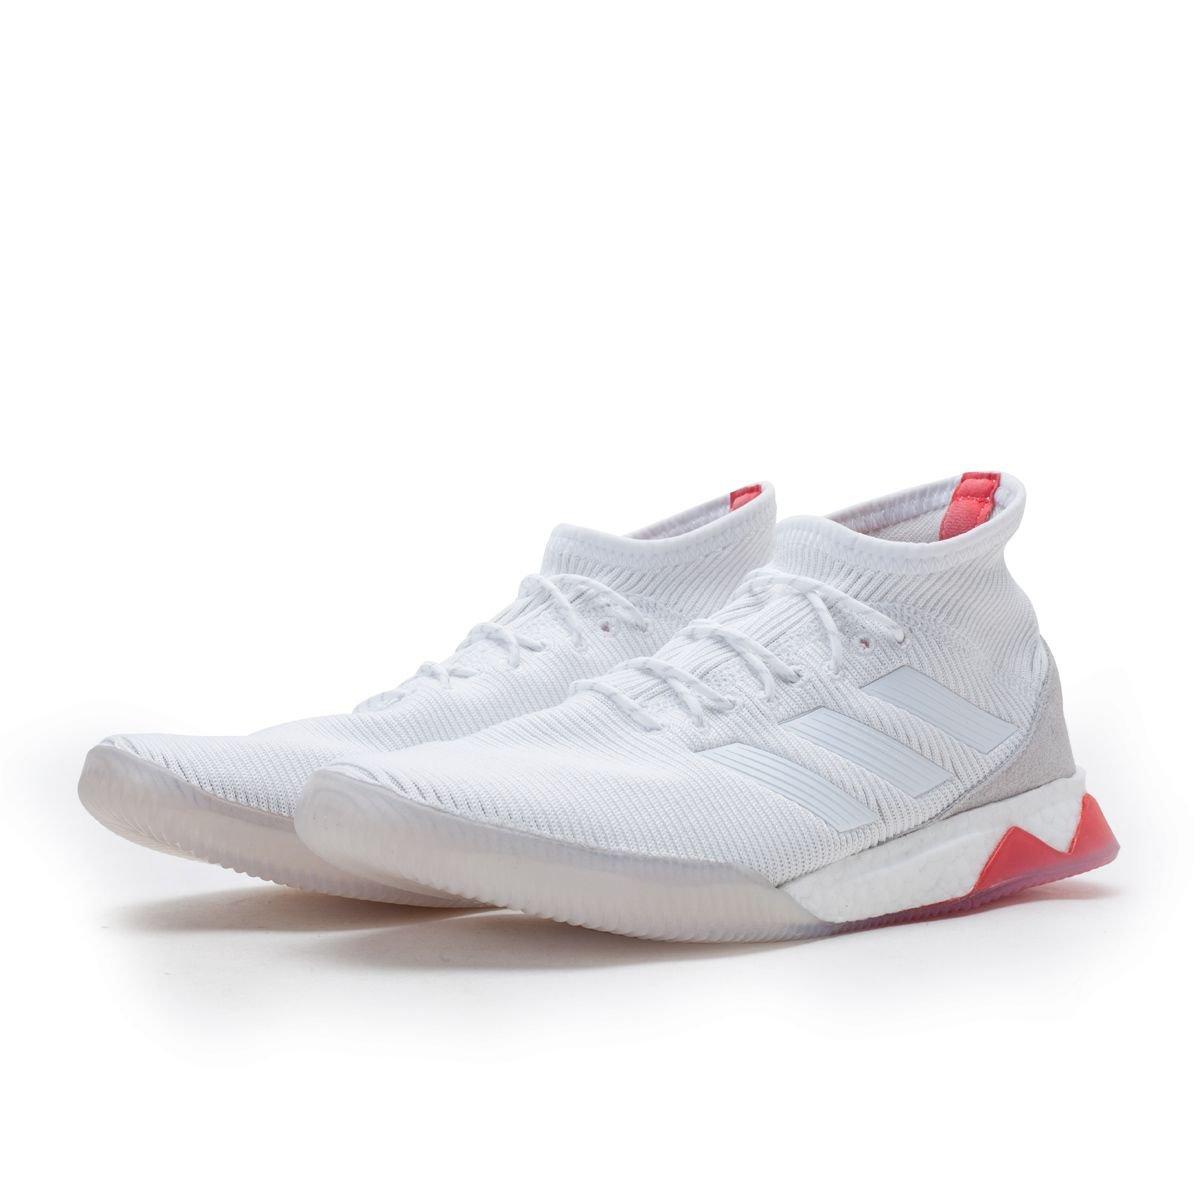 52a14eaf2f6212 Amazon Bags co Trainer Predator 1 amp  Tango Shoes uk Men s Adidas 18 pq7Ygw